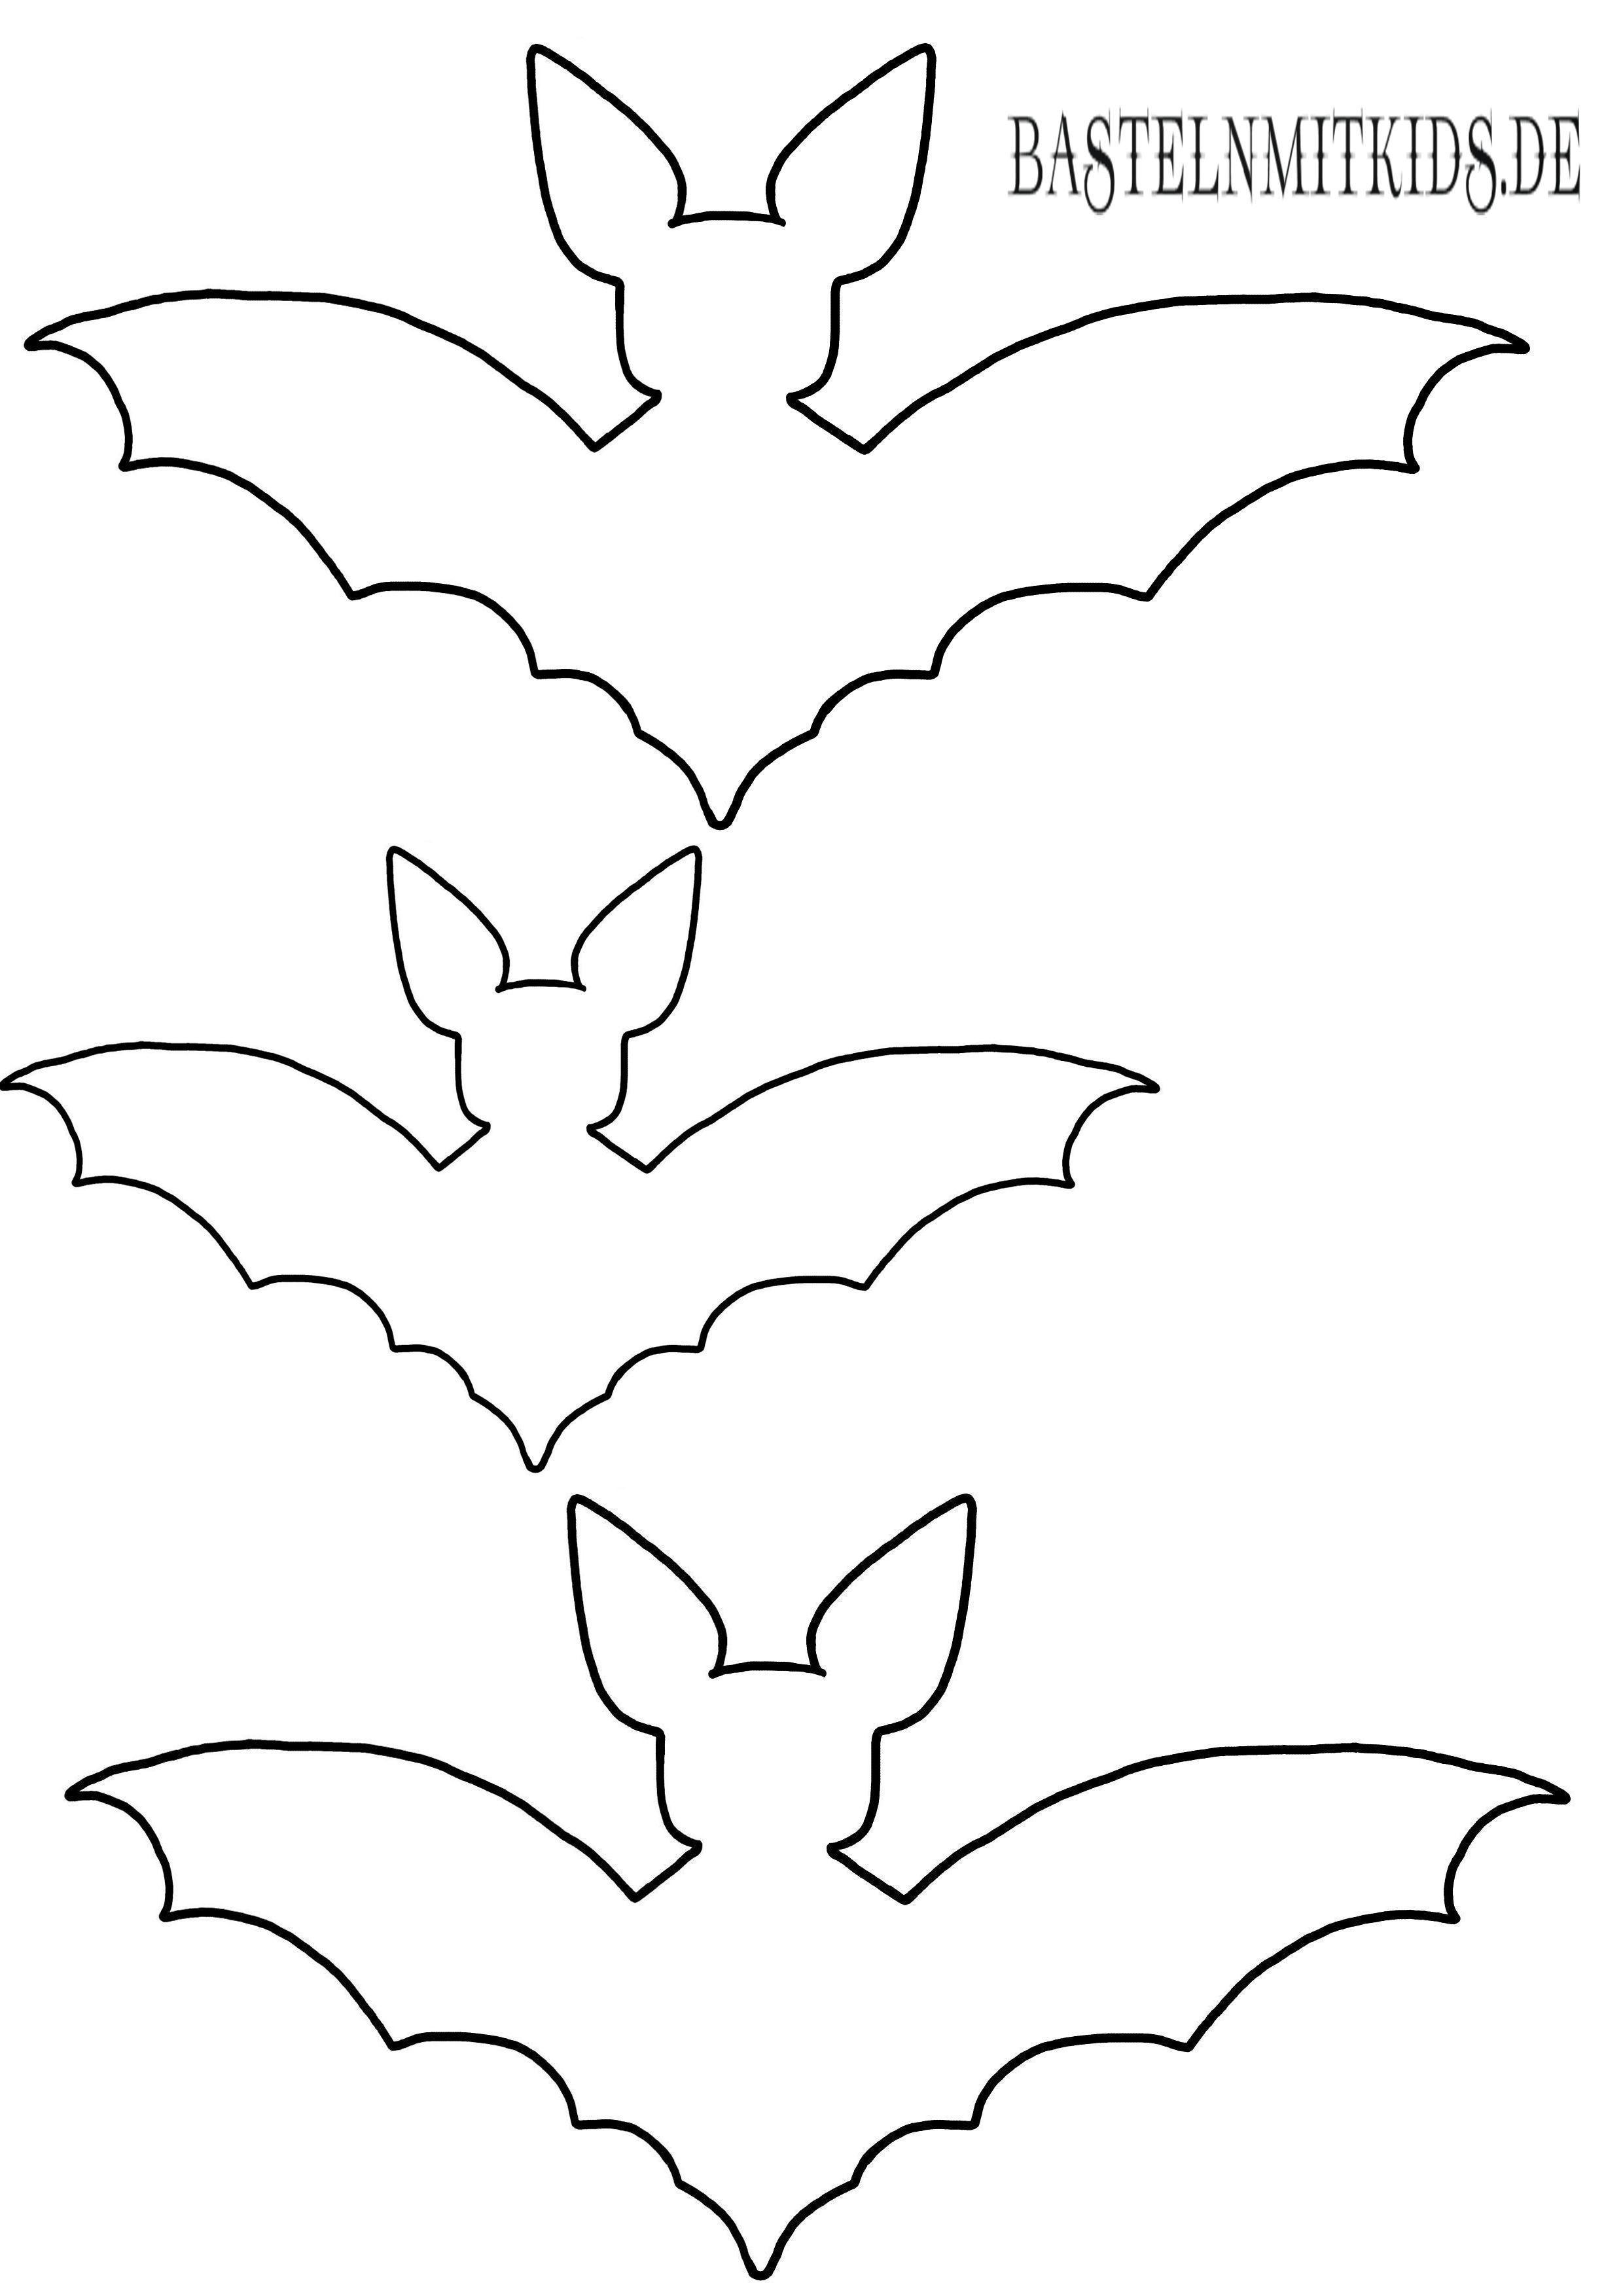 Fledermause Gut Fur Halloween Deko In 2020 Halloween Basteln Mit Kindern Fledermaus Basteln Basteln Halloween